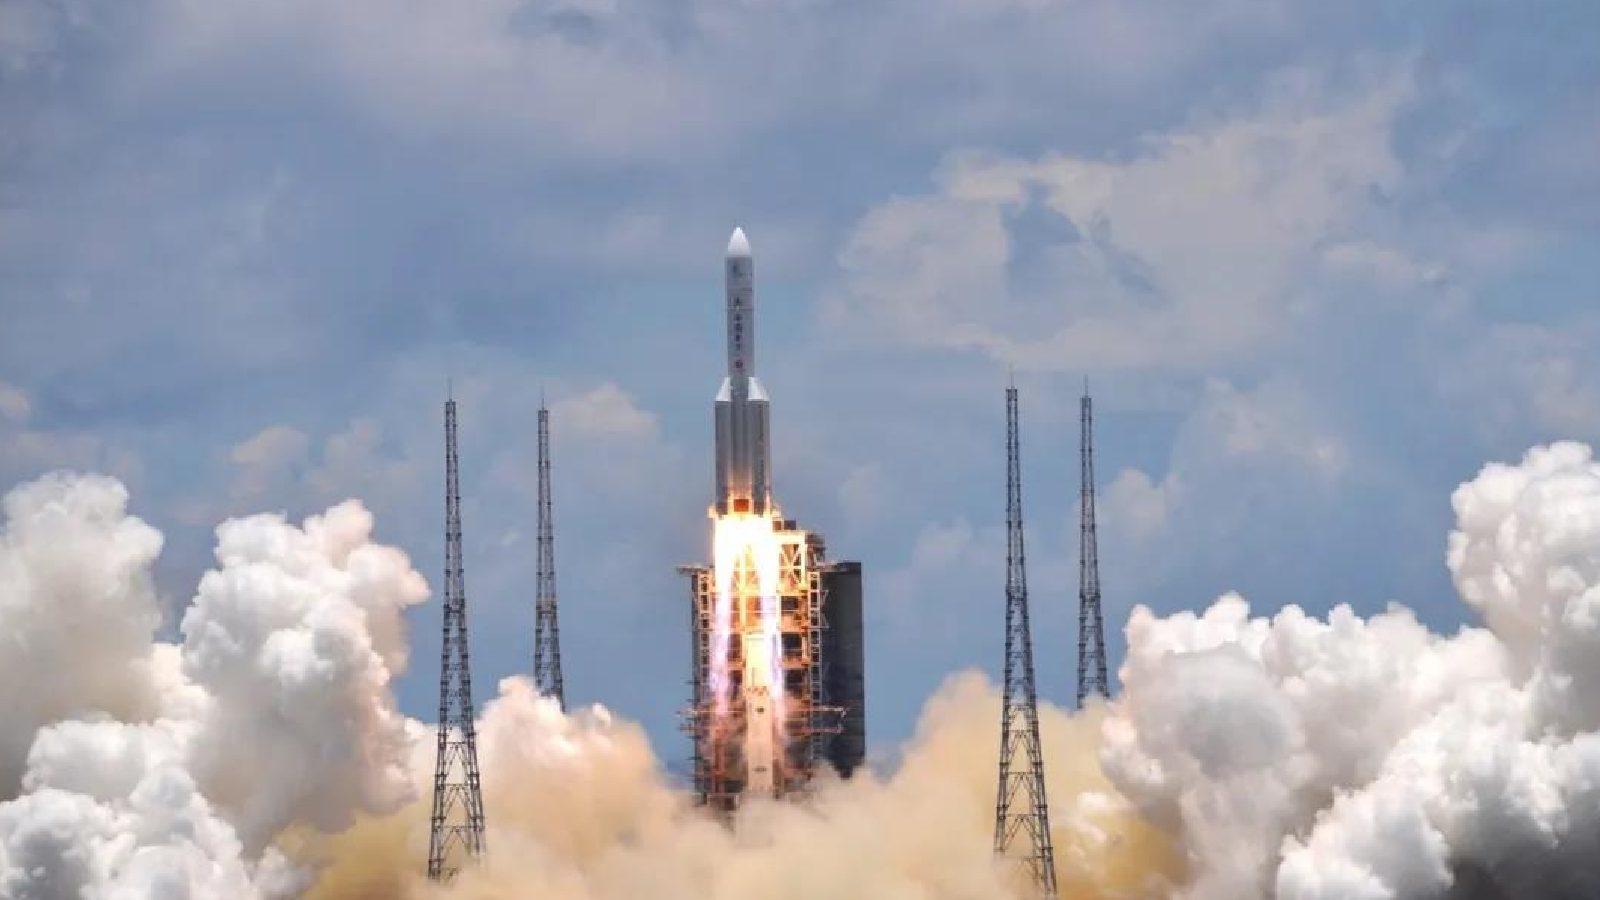 Solid Propellant Rocket Engine